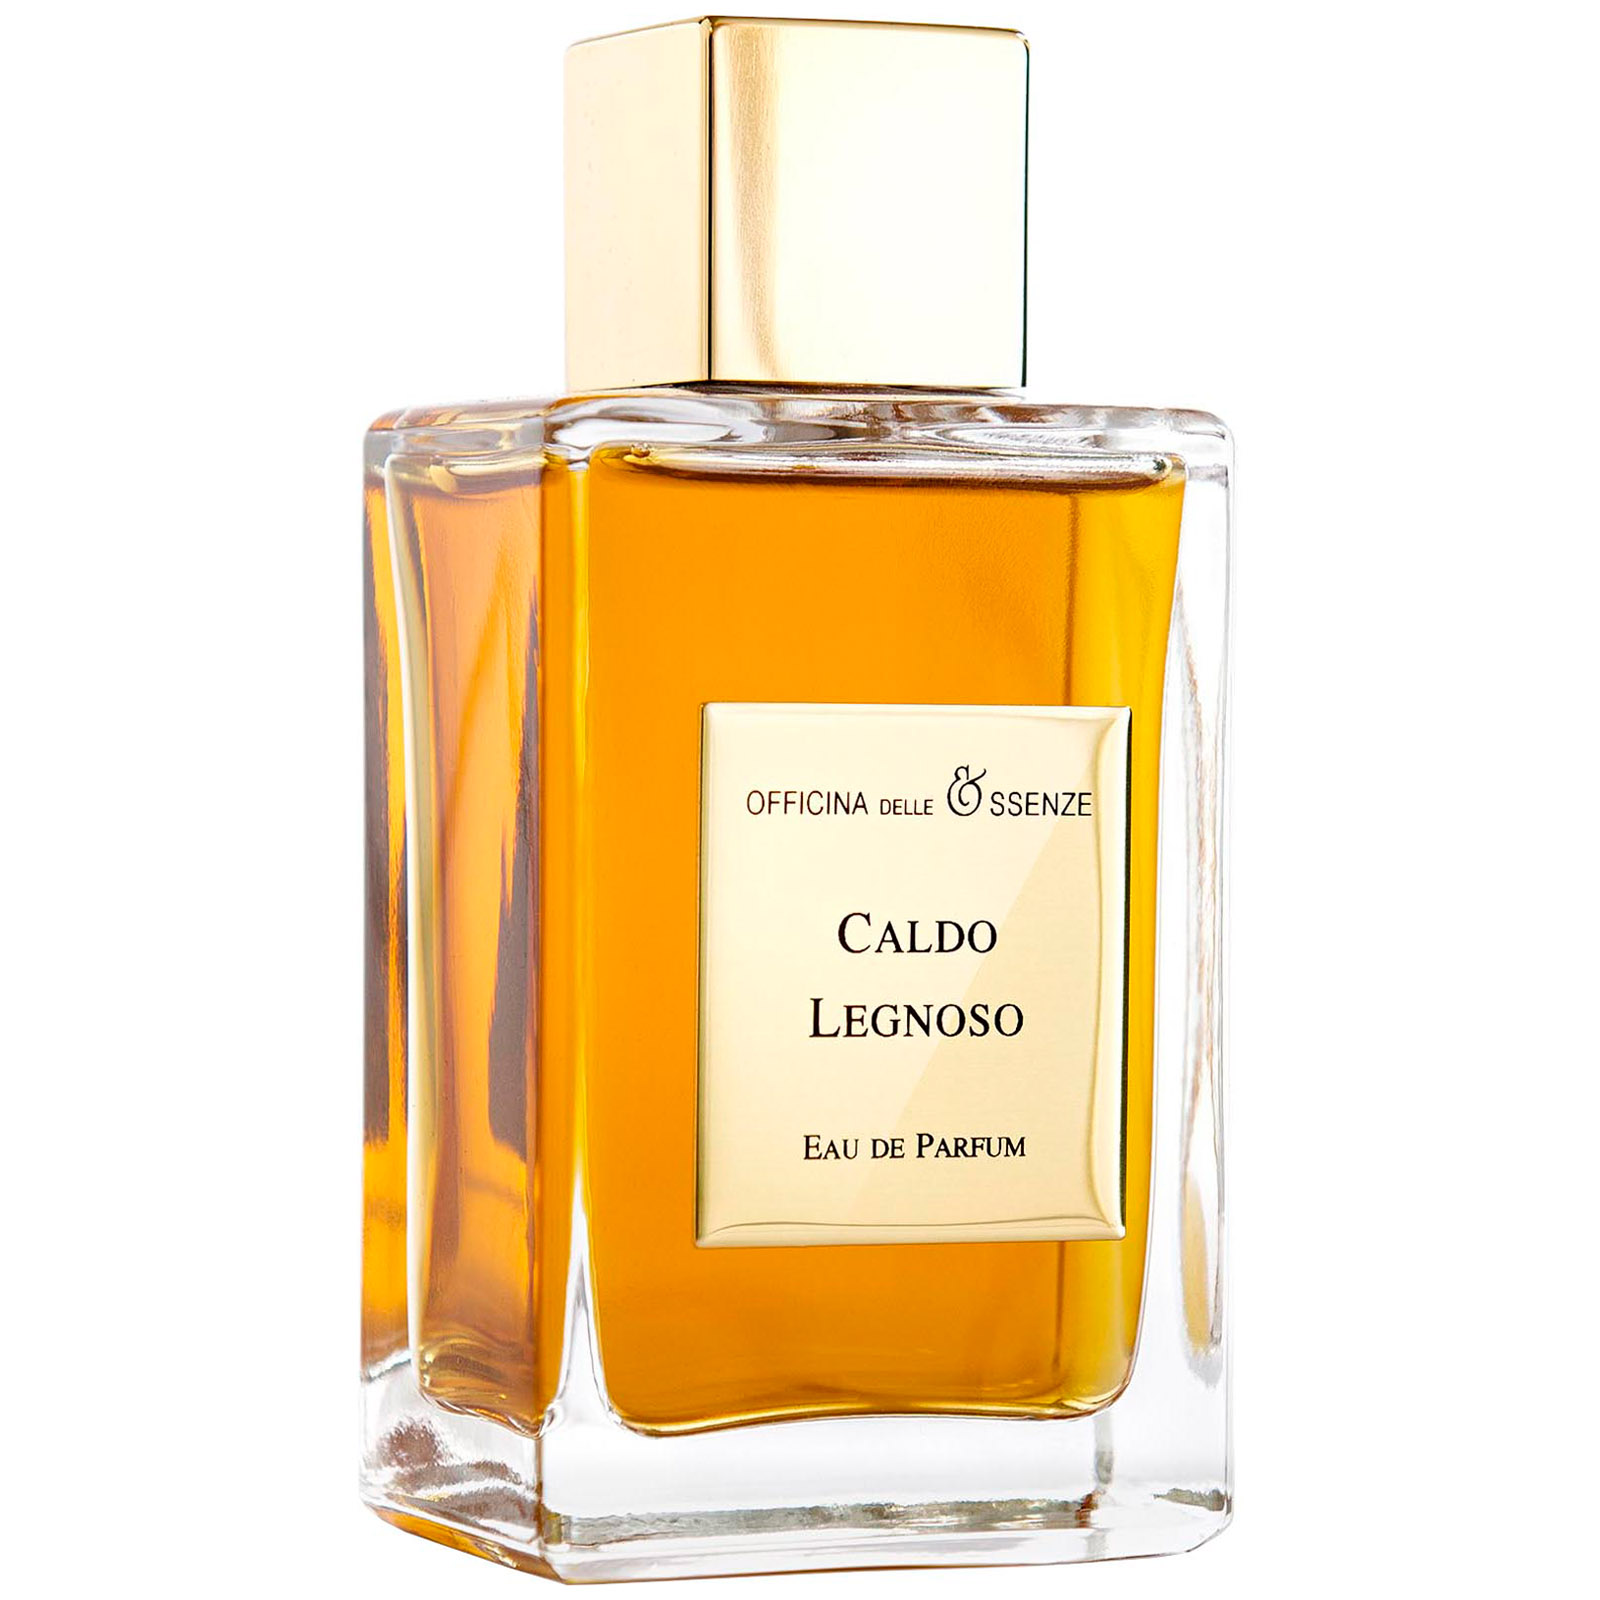 Caldo legnoso profumo eau de parfum 100 ml